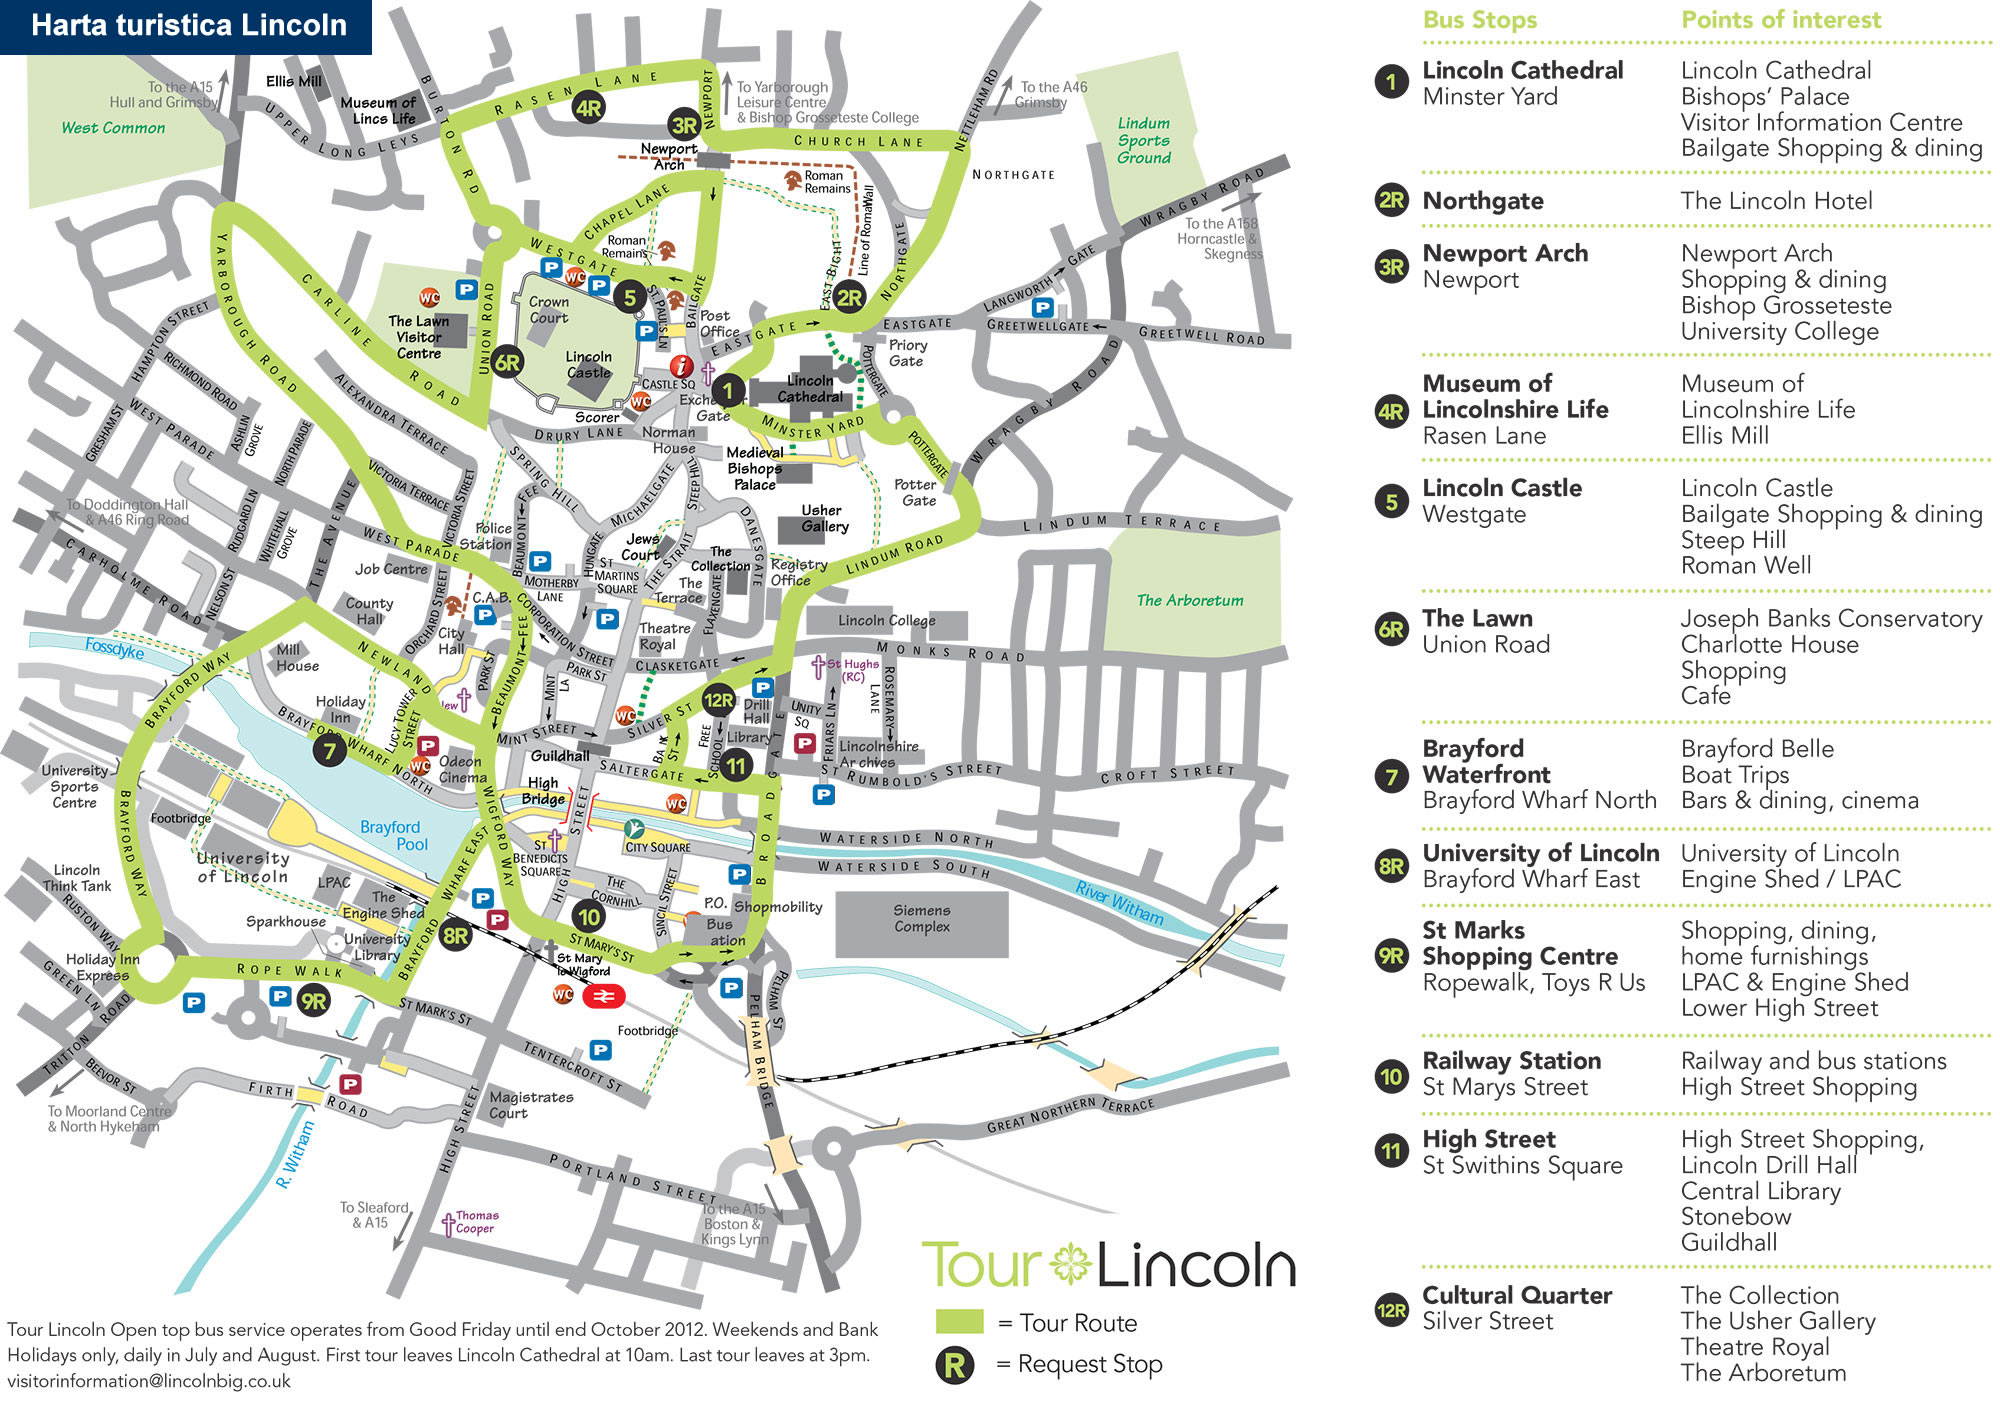 Harta transport Lincoln